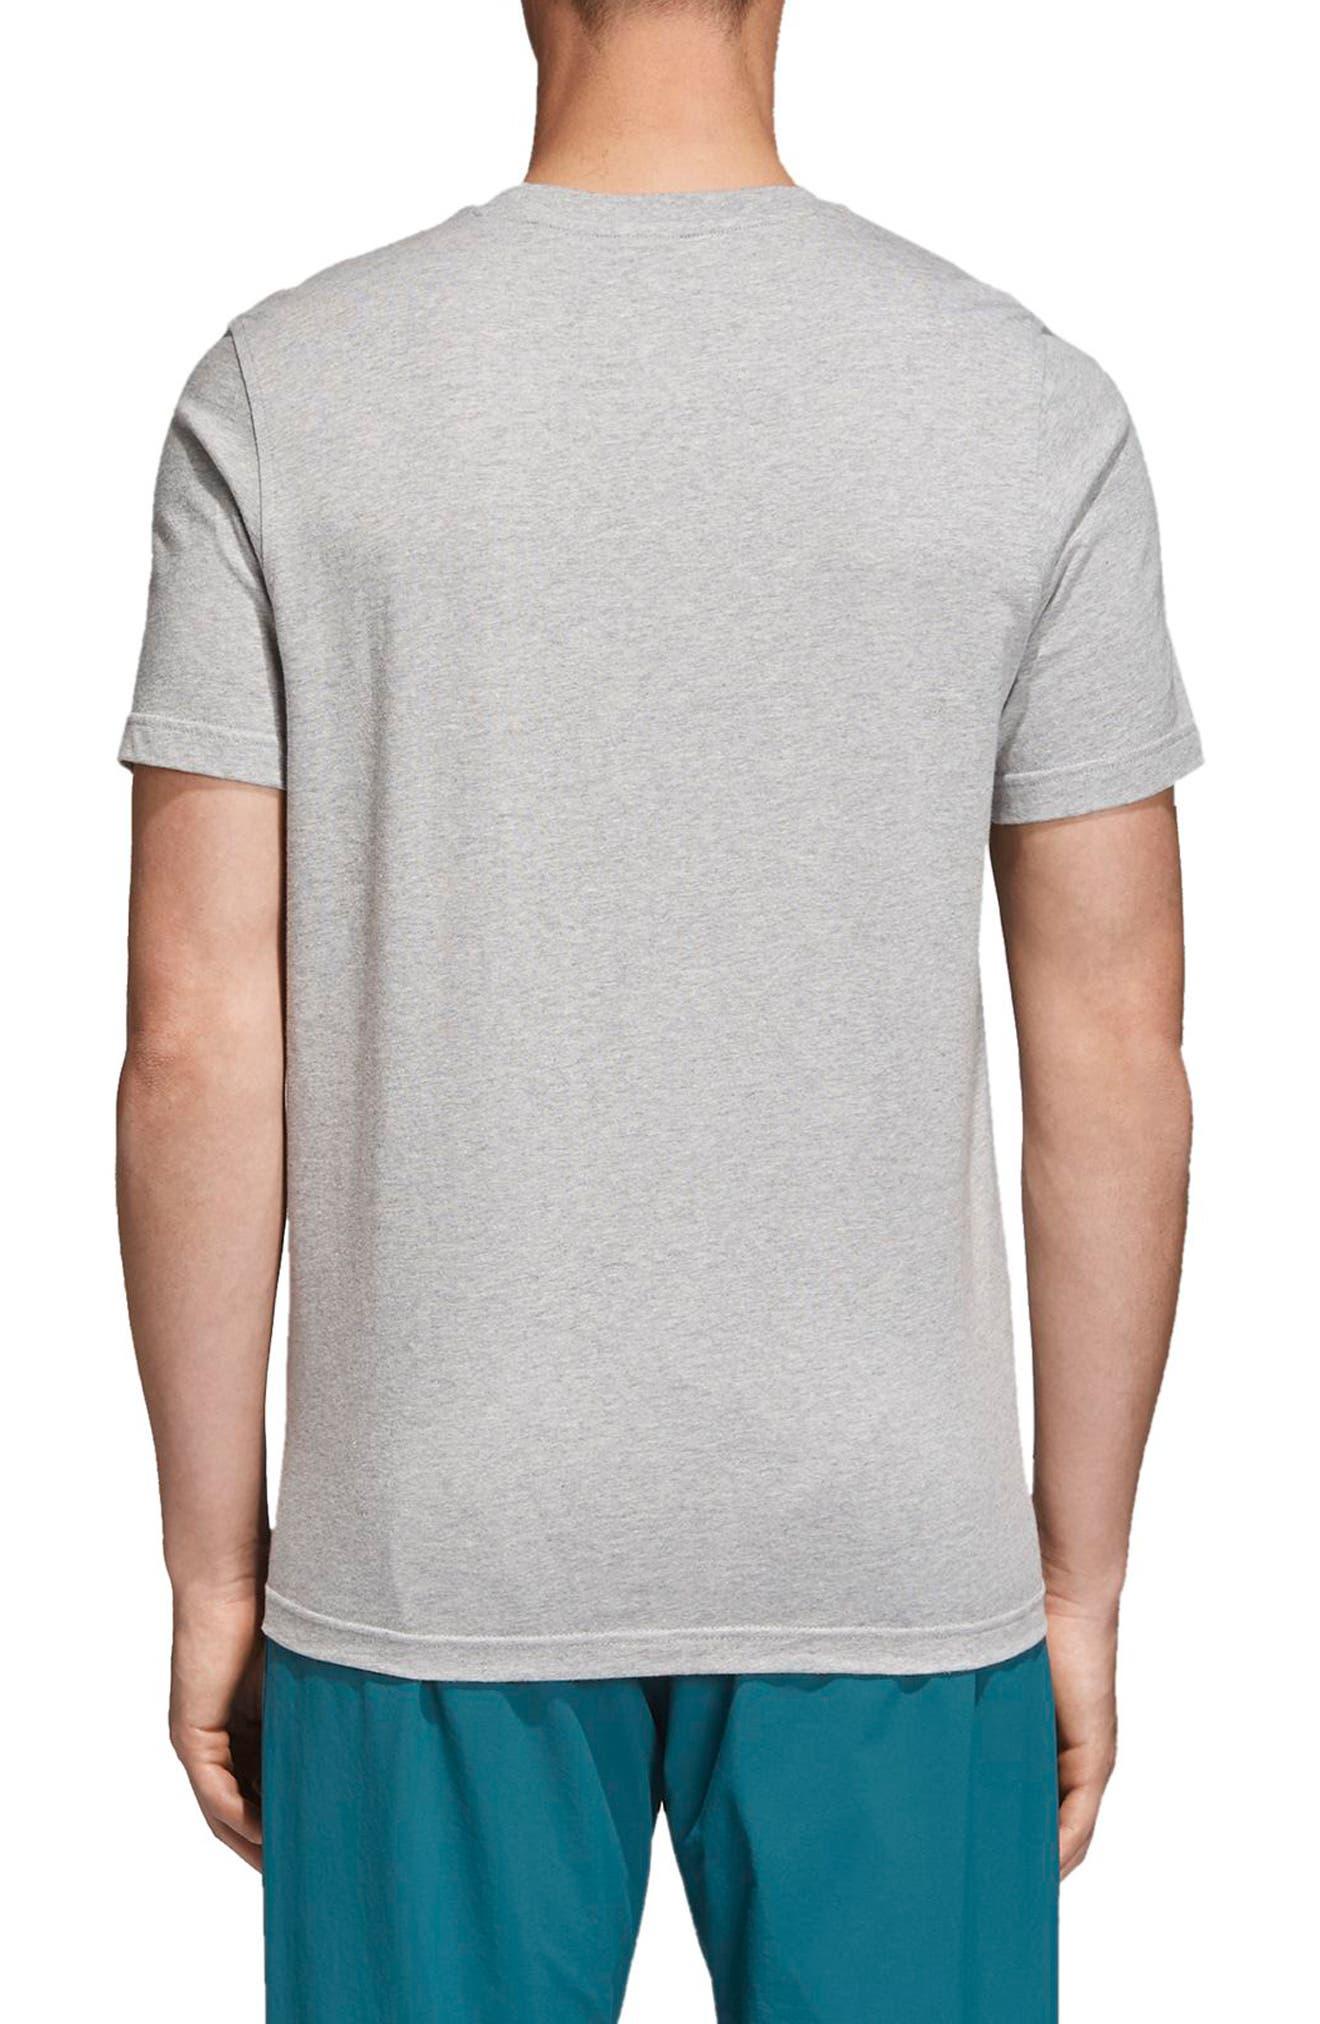 Trefoil T-Shirt,                             Alternate thumbnail 2, color,                             Medium Grey Heather